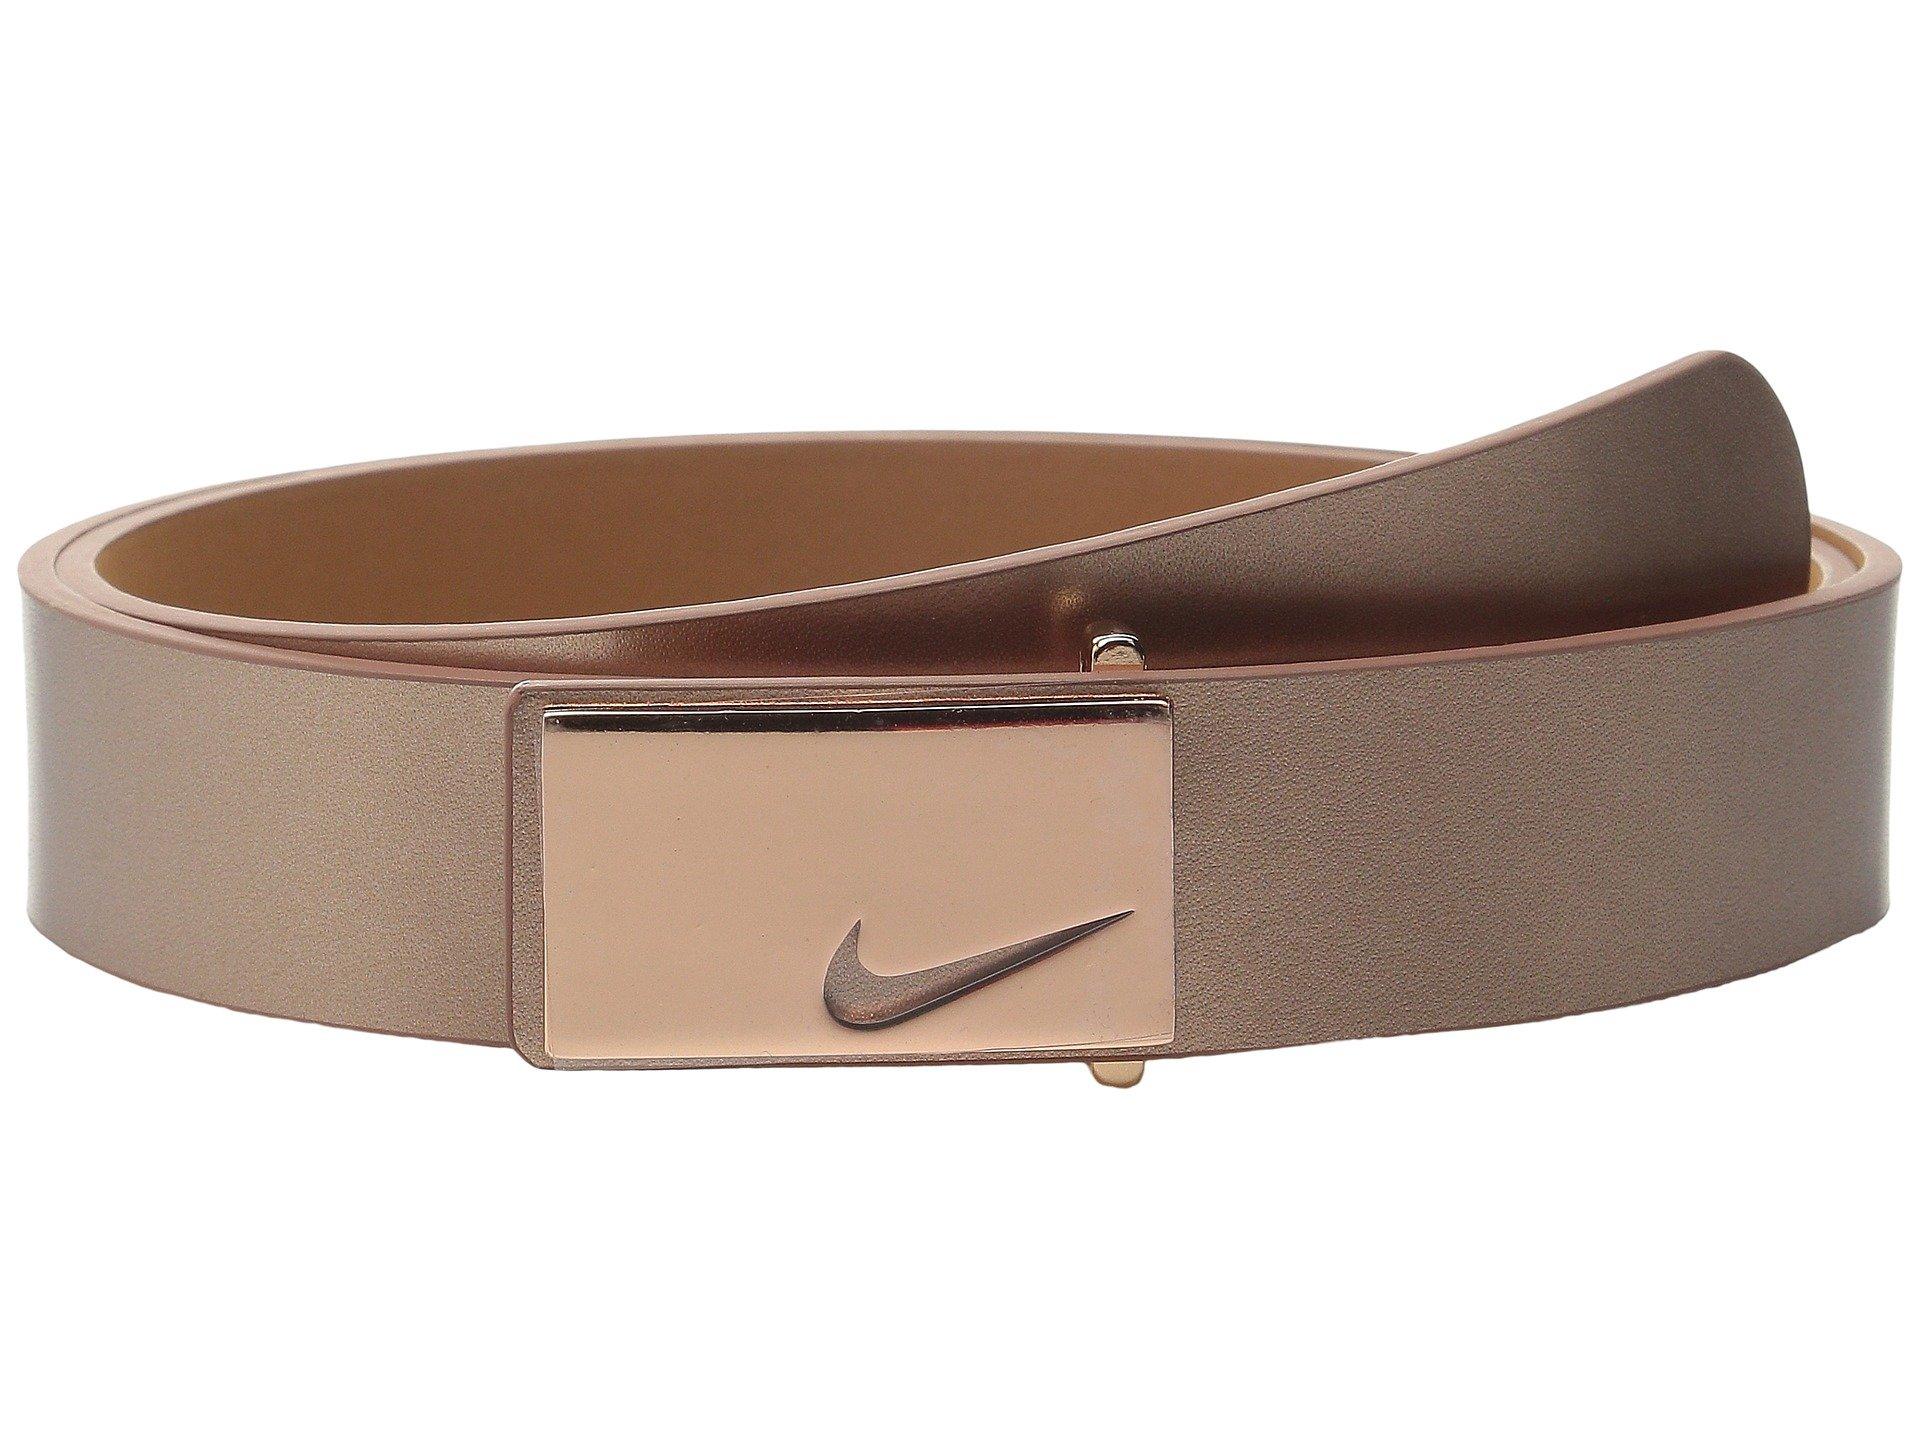 Correa o Cinturon para Mujer Nike Sleek Modern  + ike en VeoyCompro.net